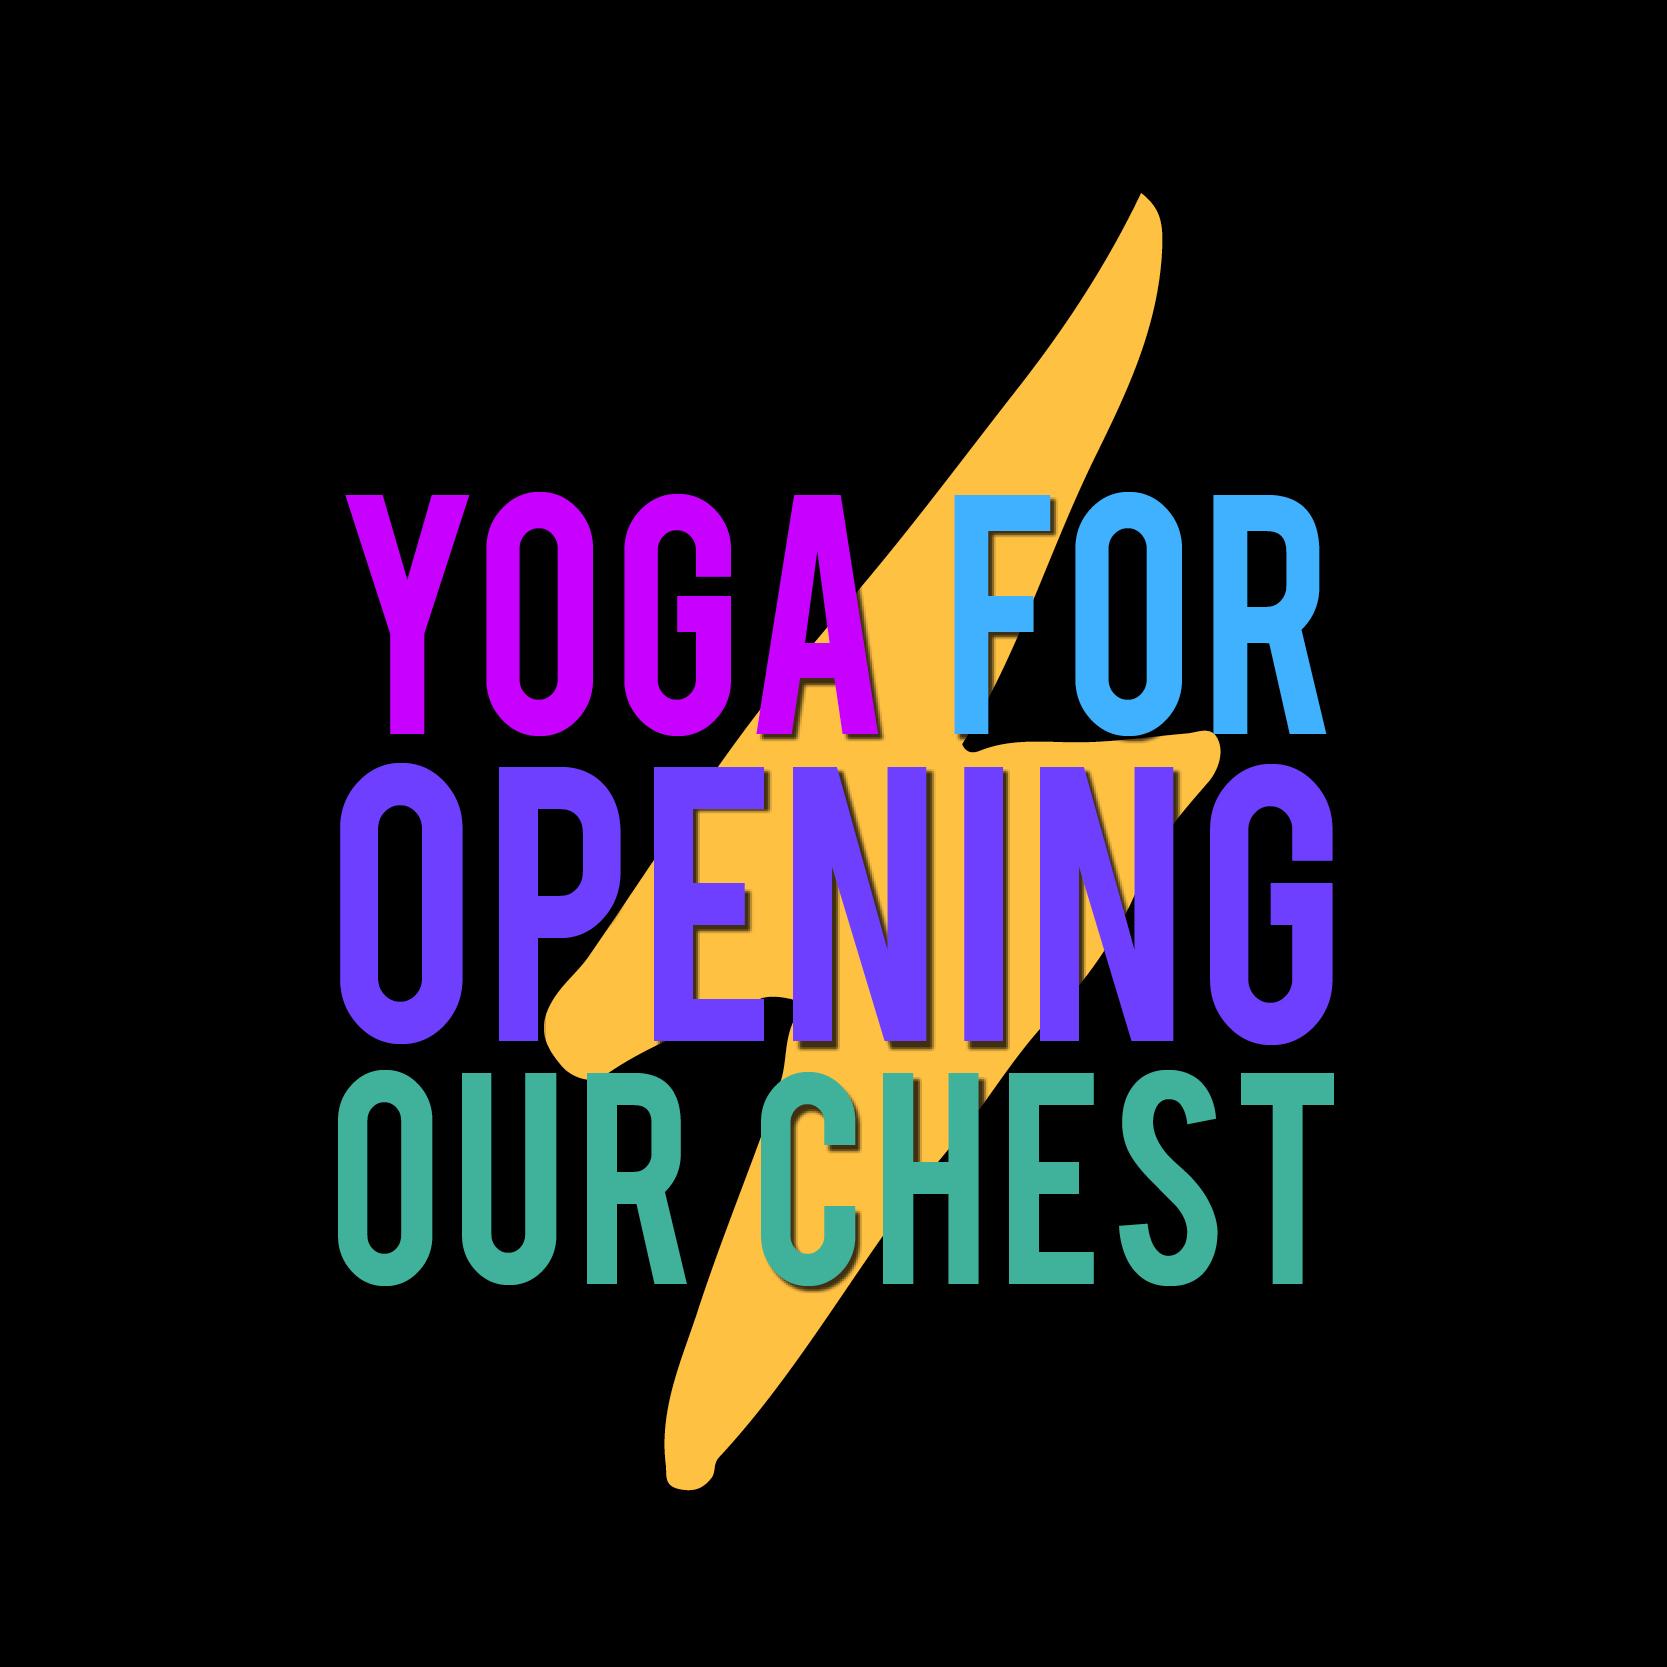 yogaforopeningourchest.jpg